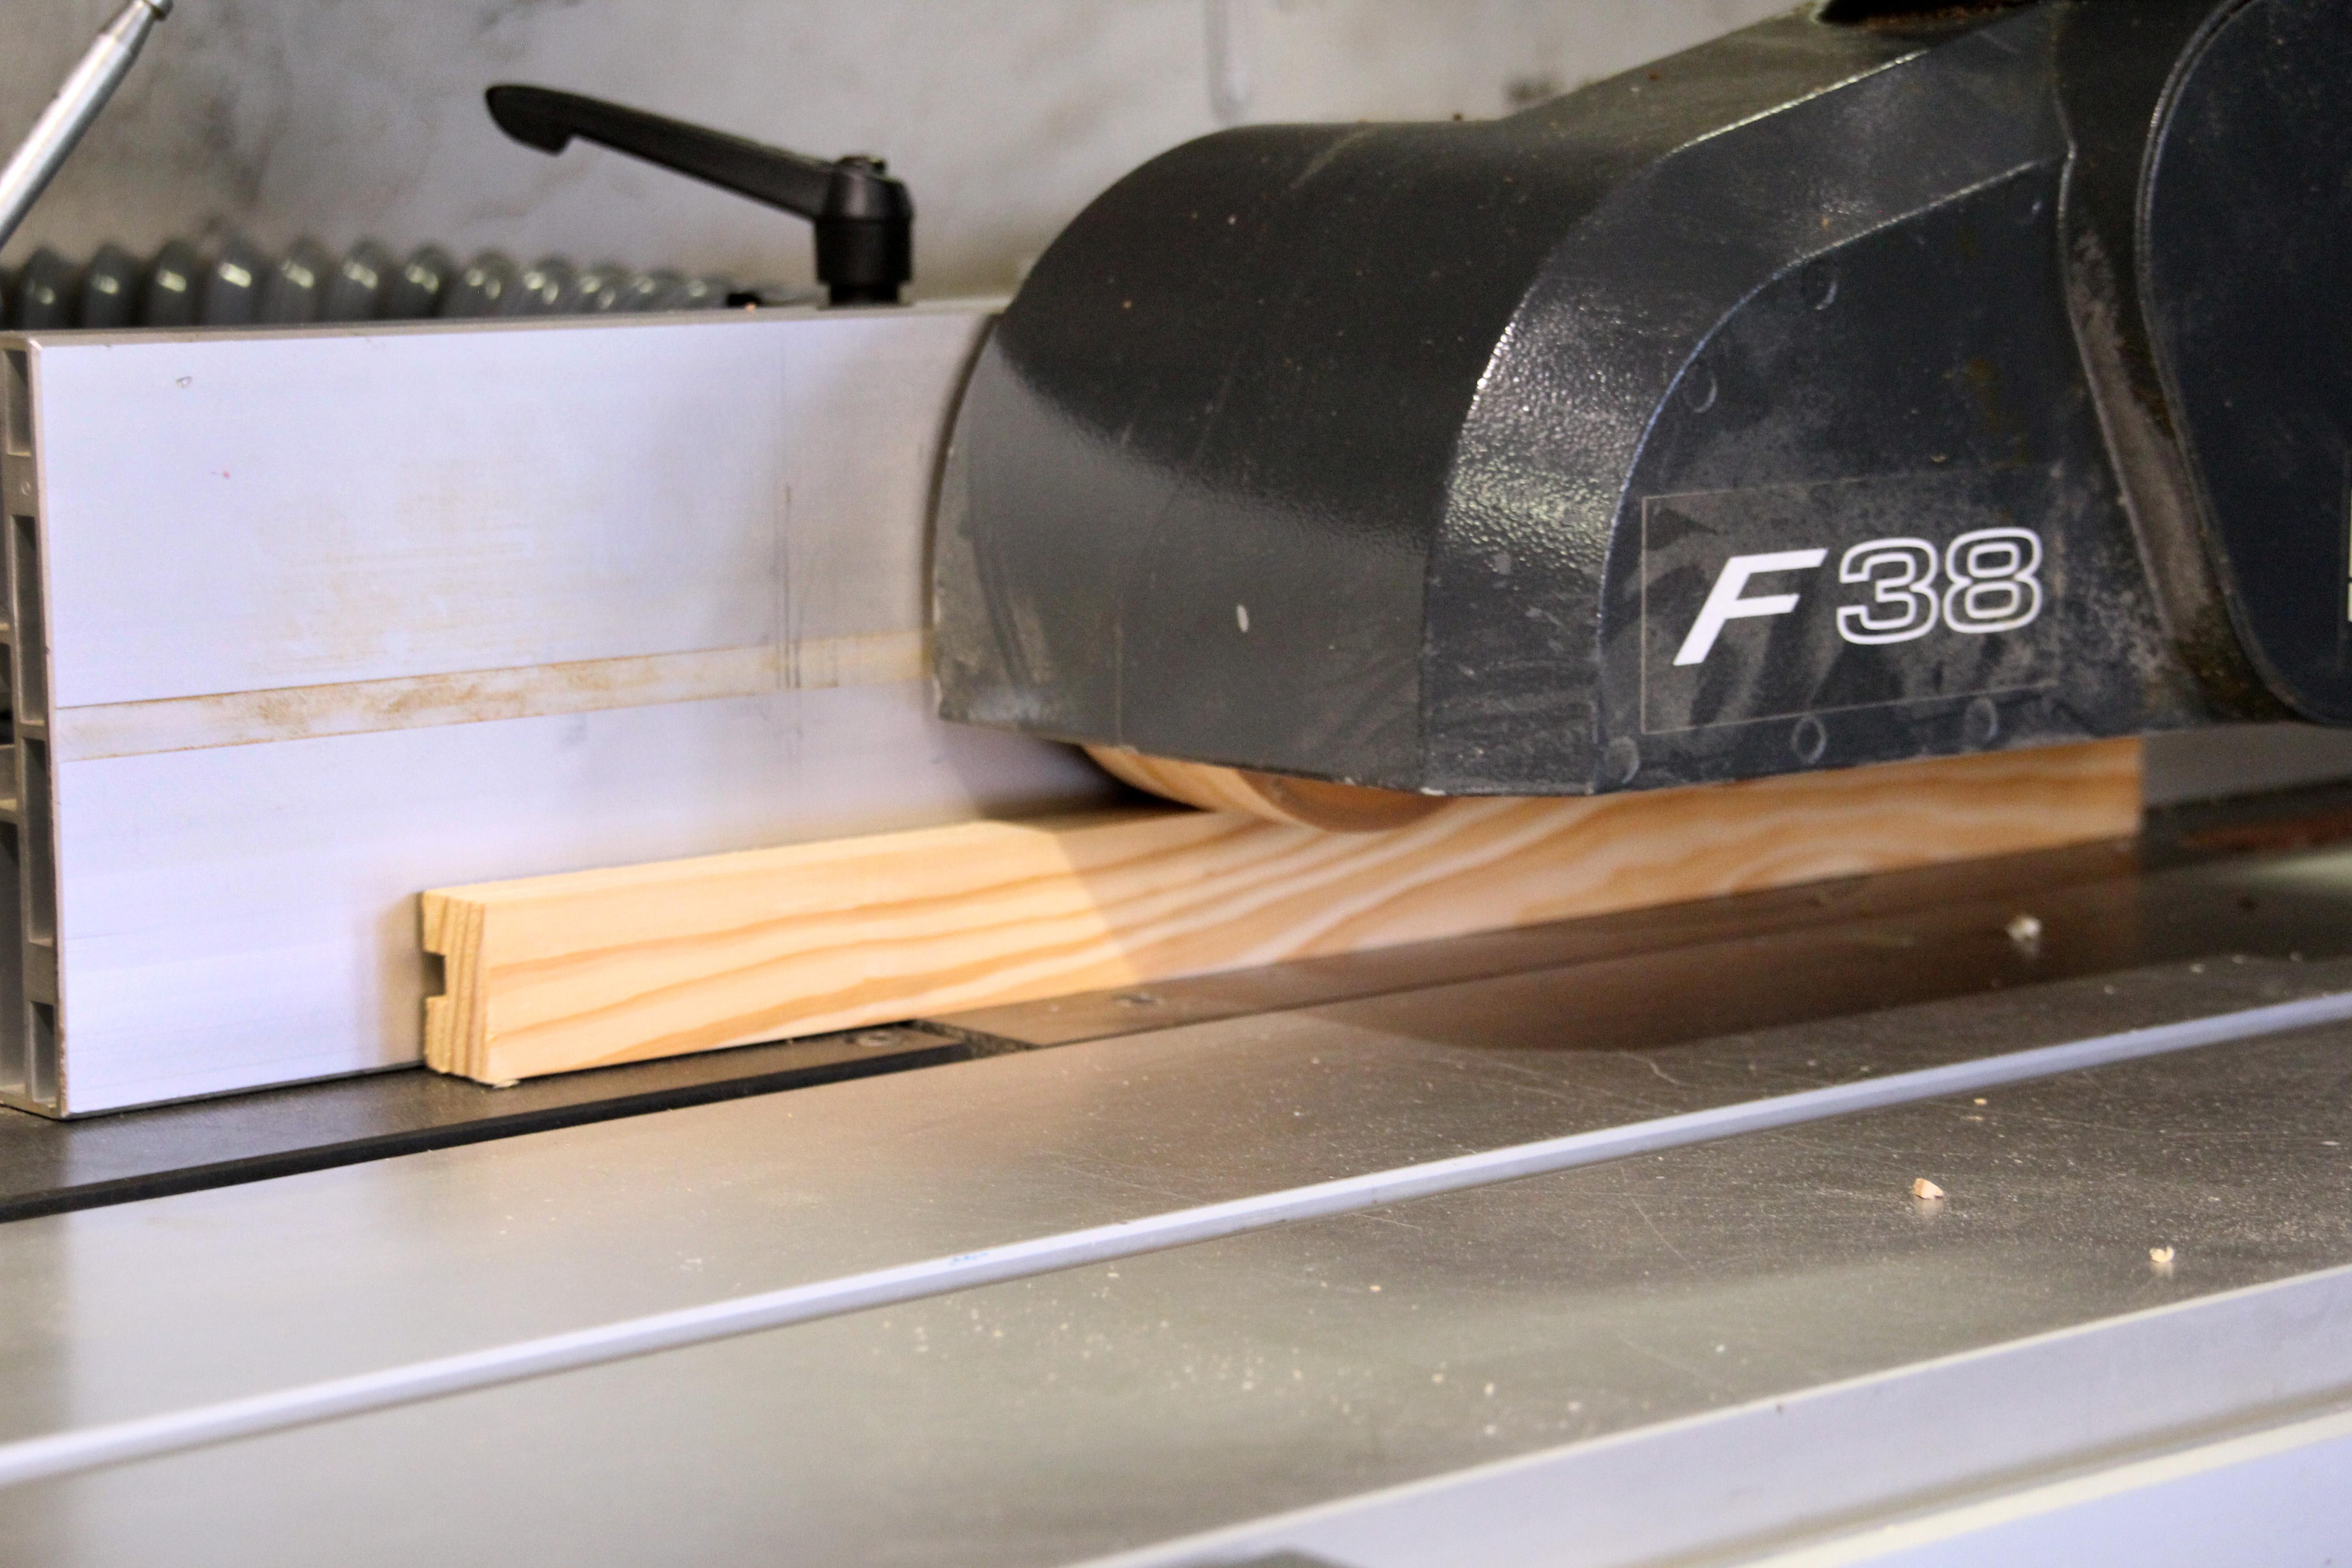 atelier de fabrication ruche delandrea fabricant de ruches made in france